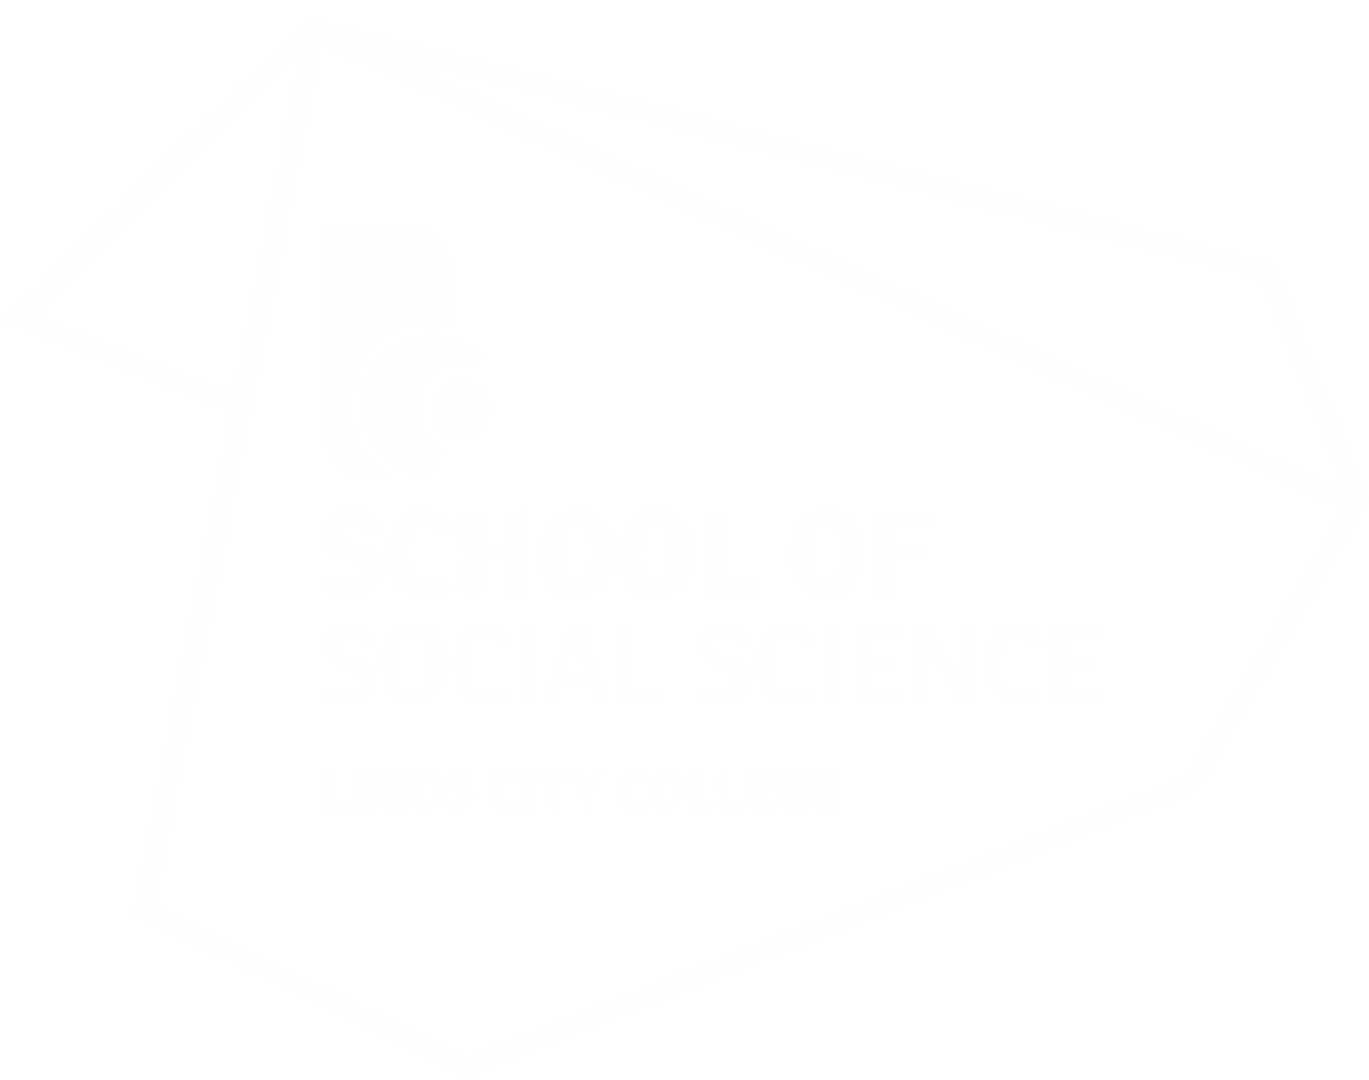 School of Social Science